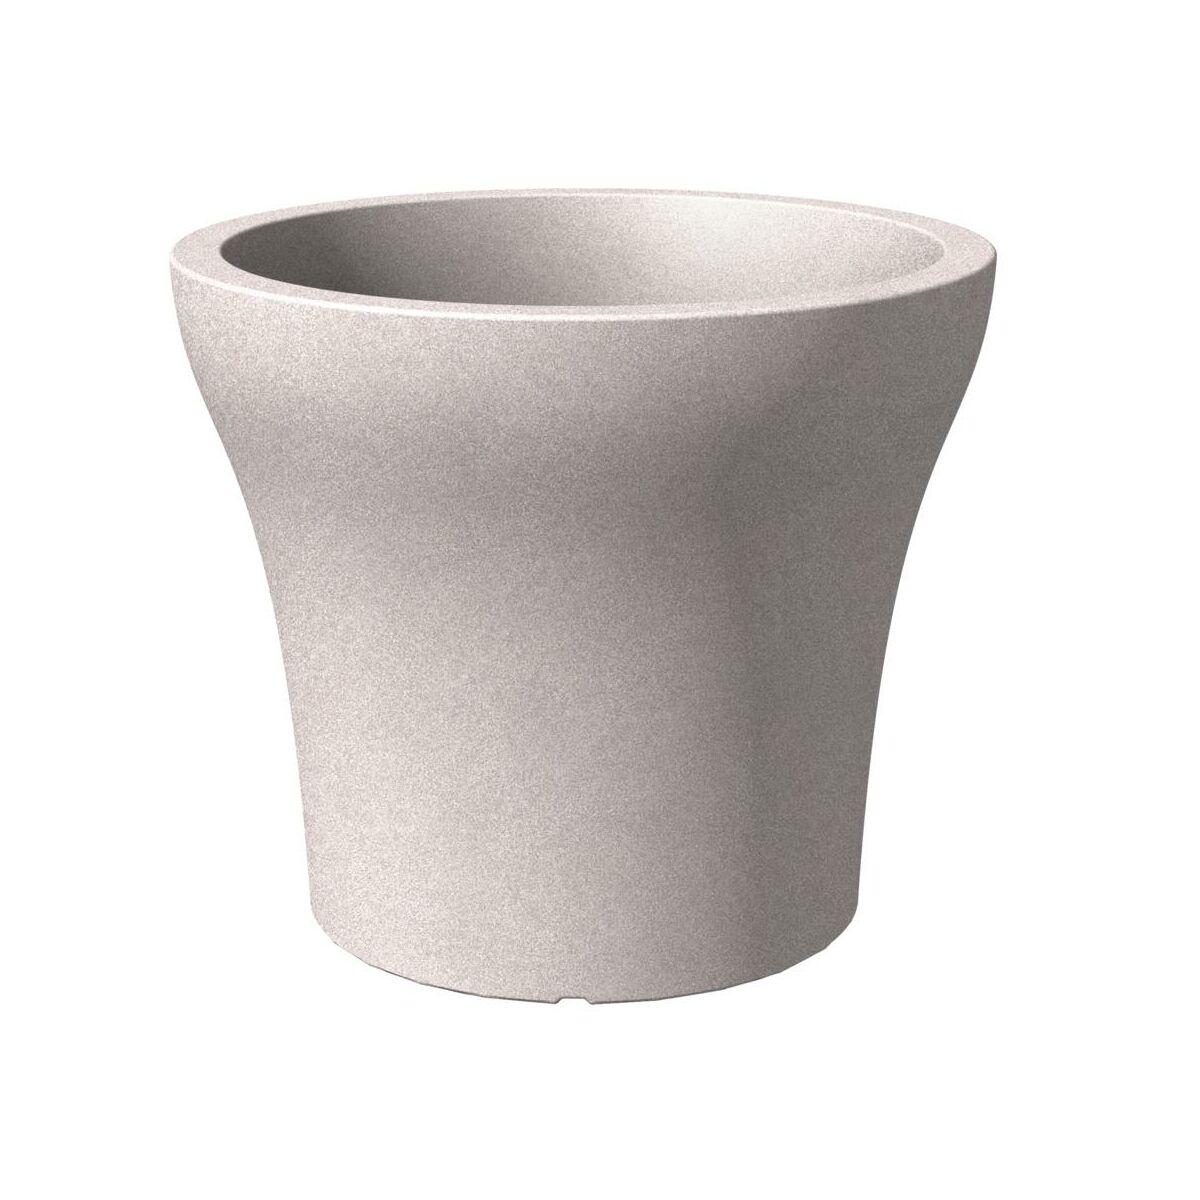 doniczka taupe granit scheurich sprawd opinie w leroy merlin. Black Bedroom Furniture Sets. Home Design Ideas